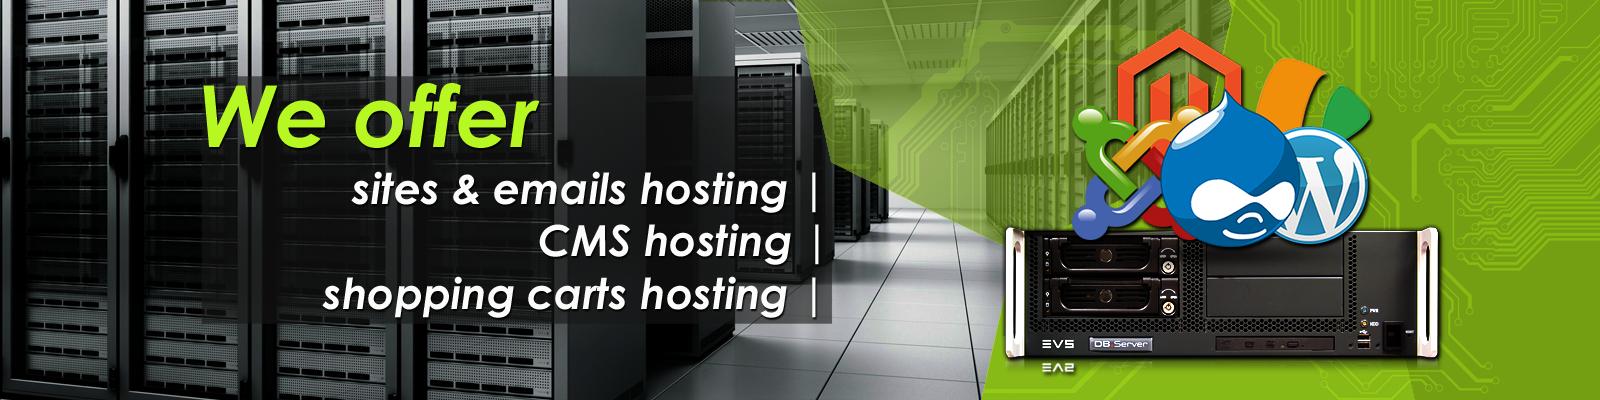 017-web-hosting